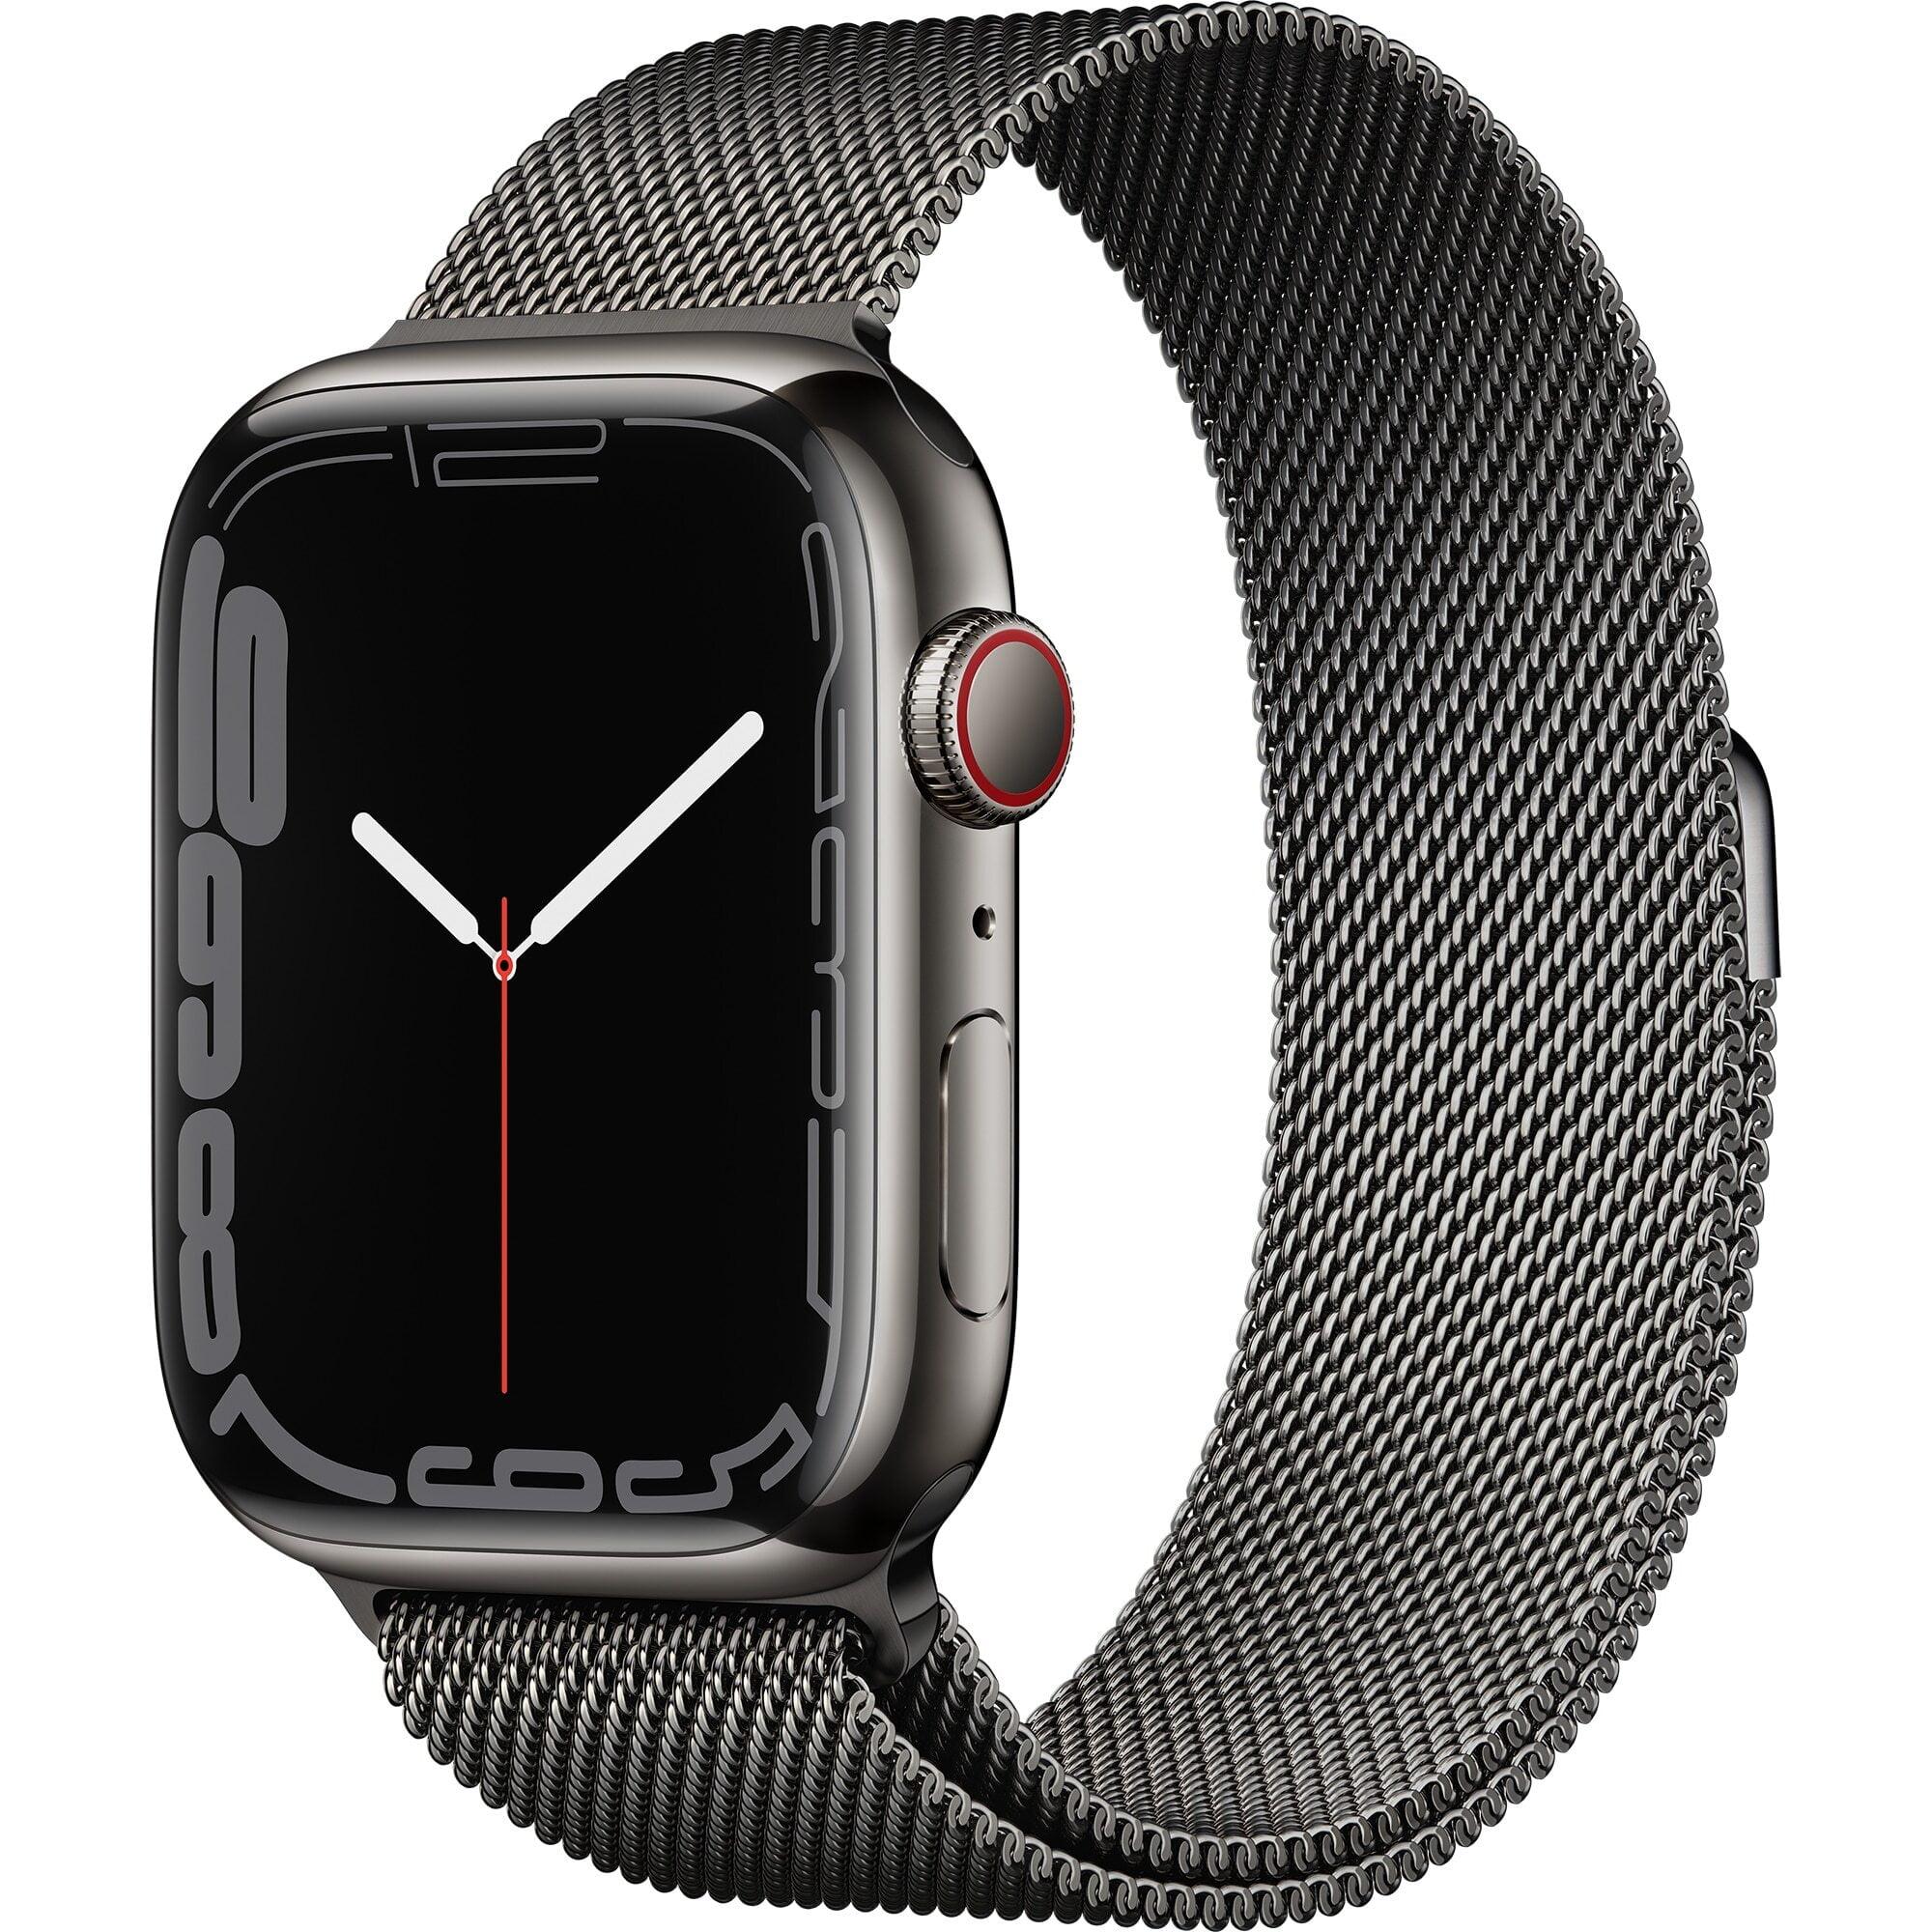 Ceas Smartwatch Apple Watch Series 7, GPS + Cellular, 45mm Graphite Stainless Steel Case, Graphite Milanese Loop